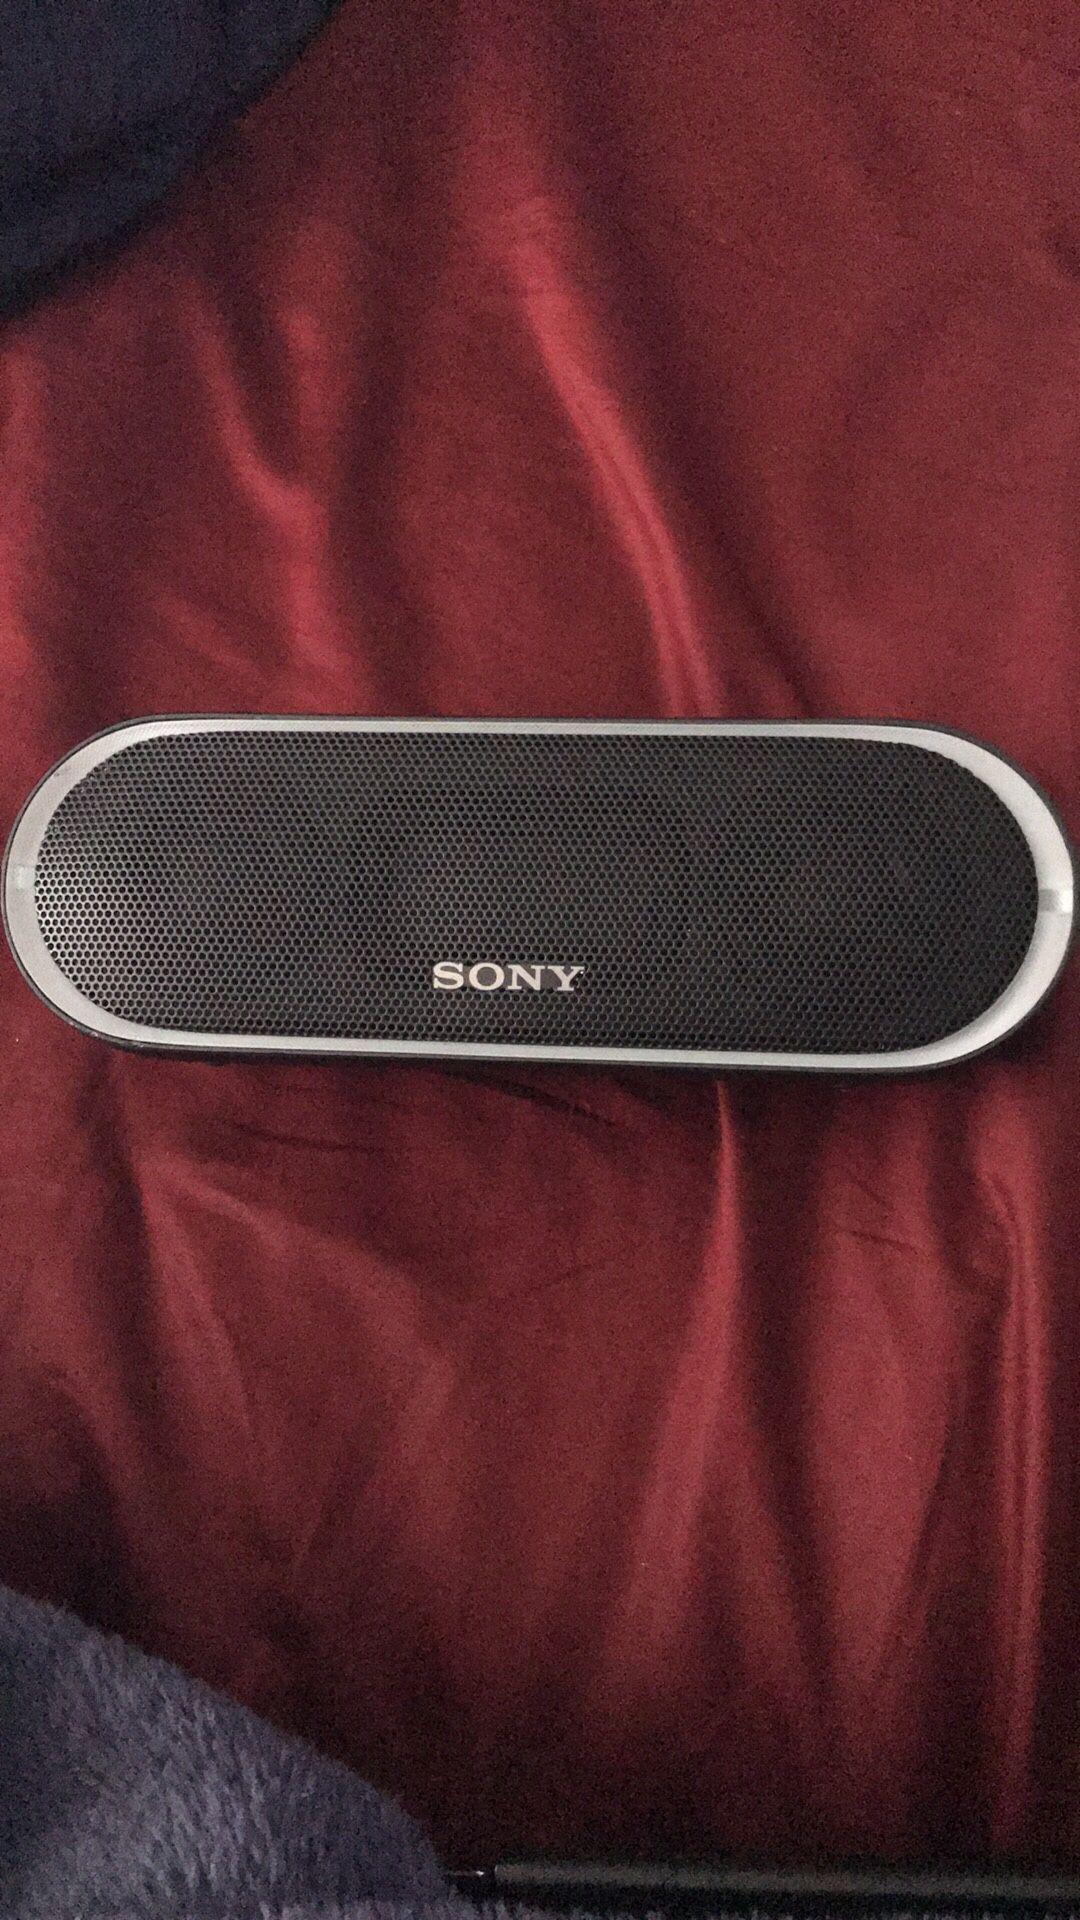 Don't see-xb 20 Bluetooth speaker